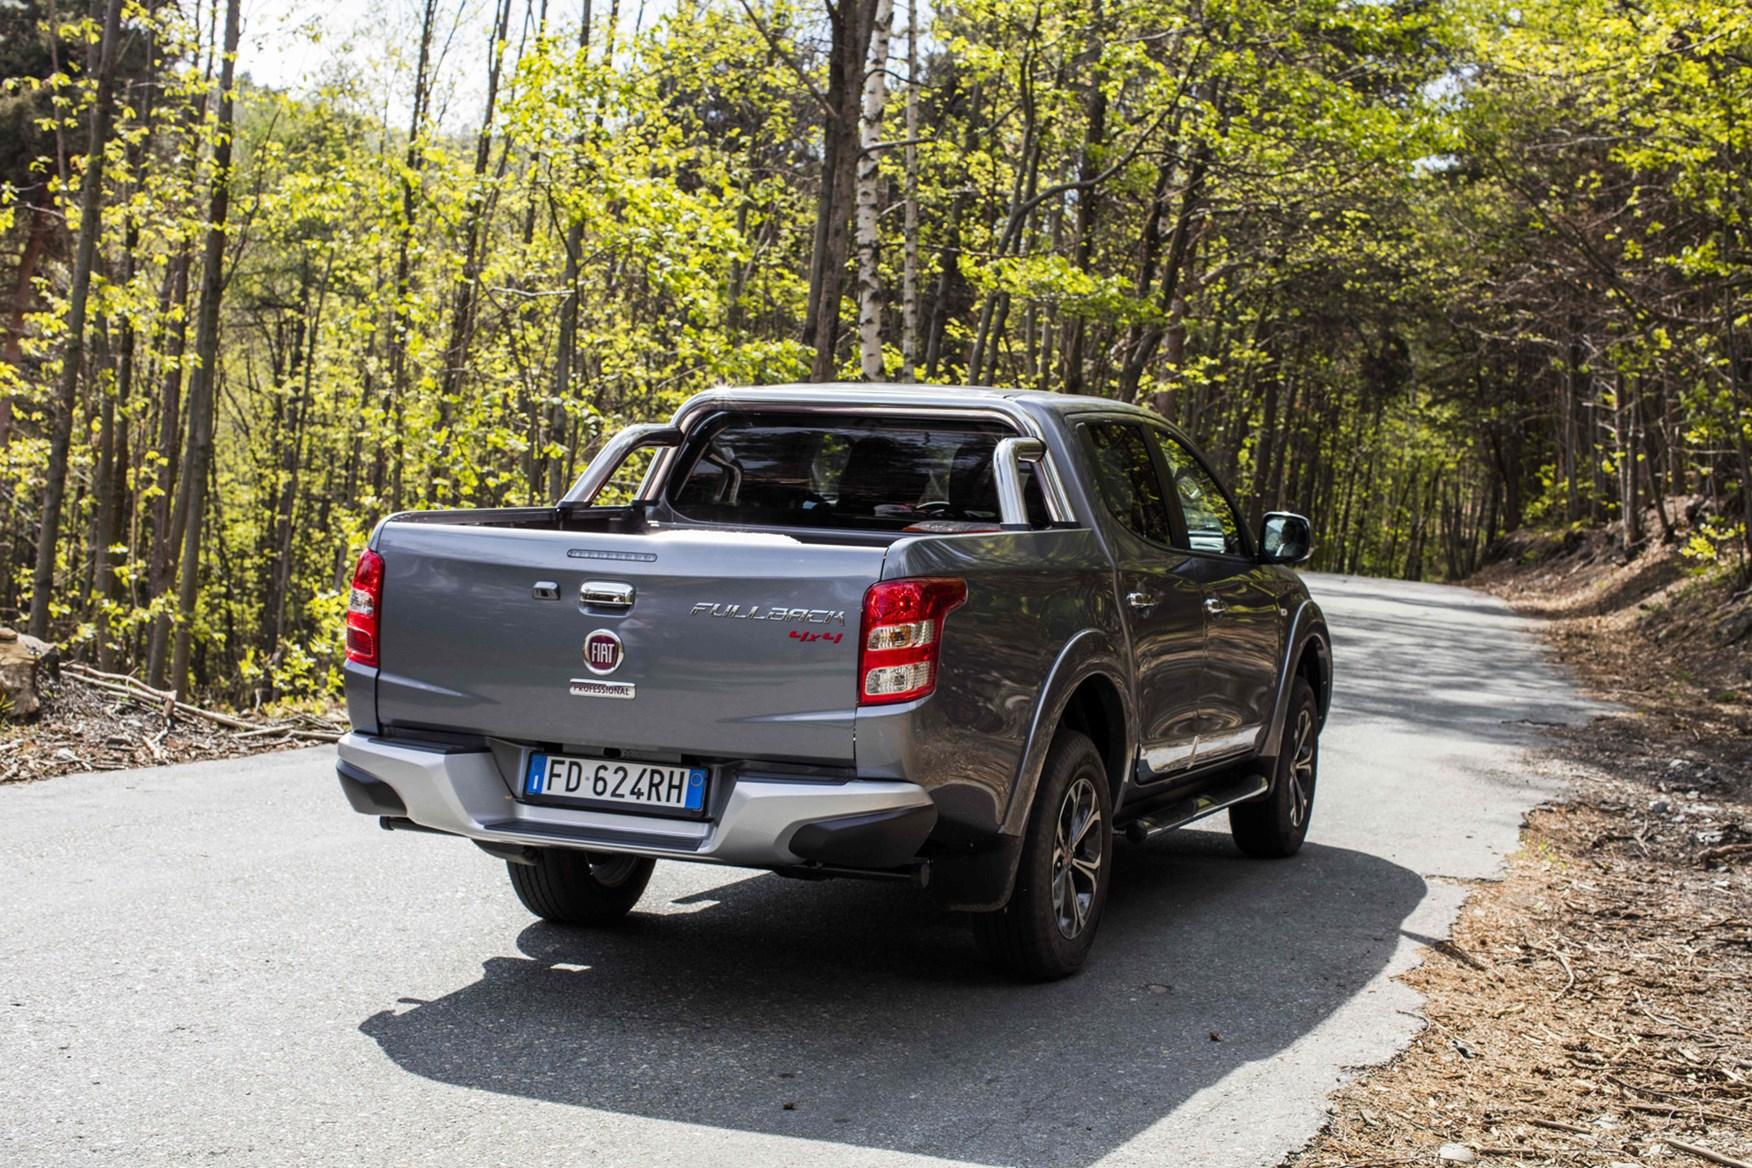 Fiat Fullback full review on Parkers Vans - rear